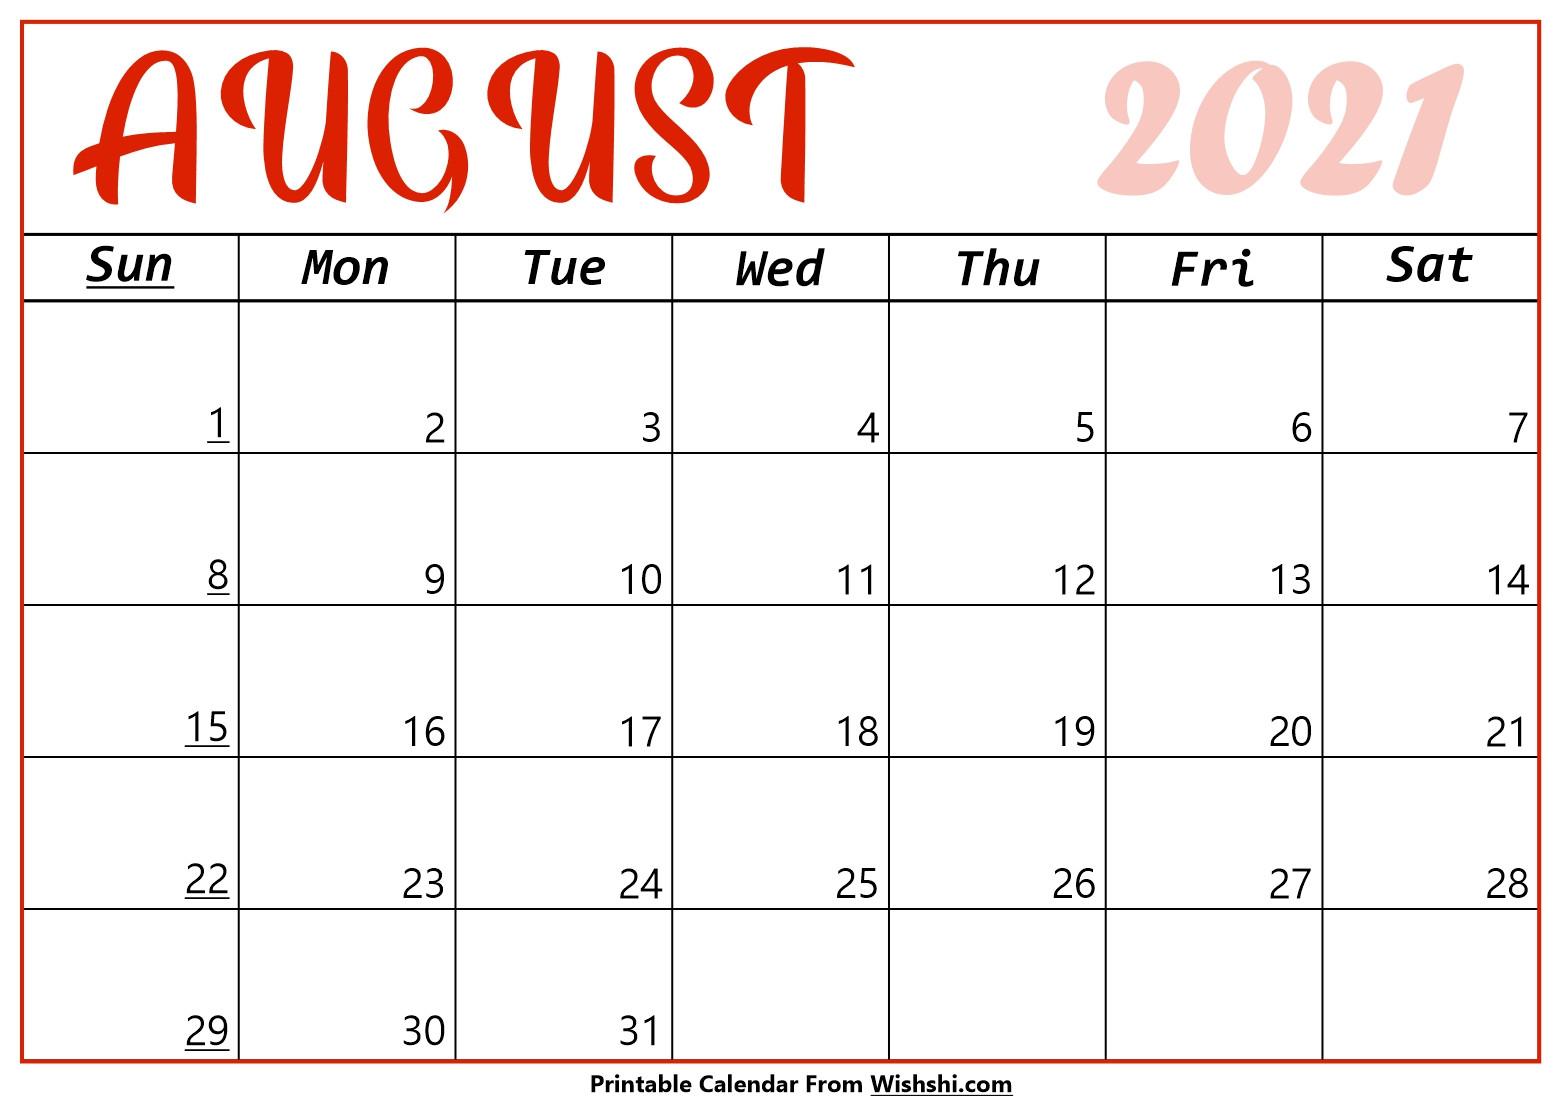 August 2021 Calendar Printable - Free Printable Calendars-Printable Bill Calendar 2021